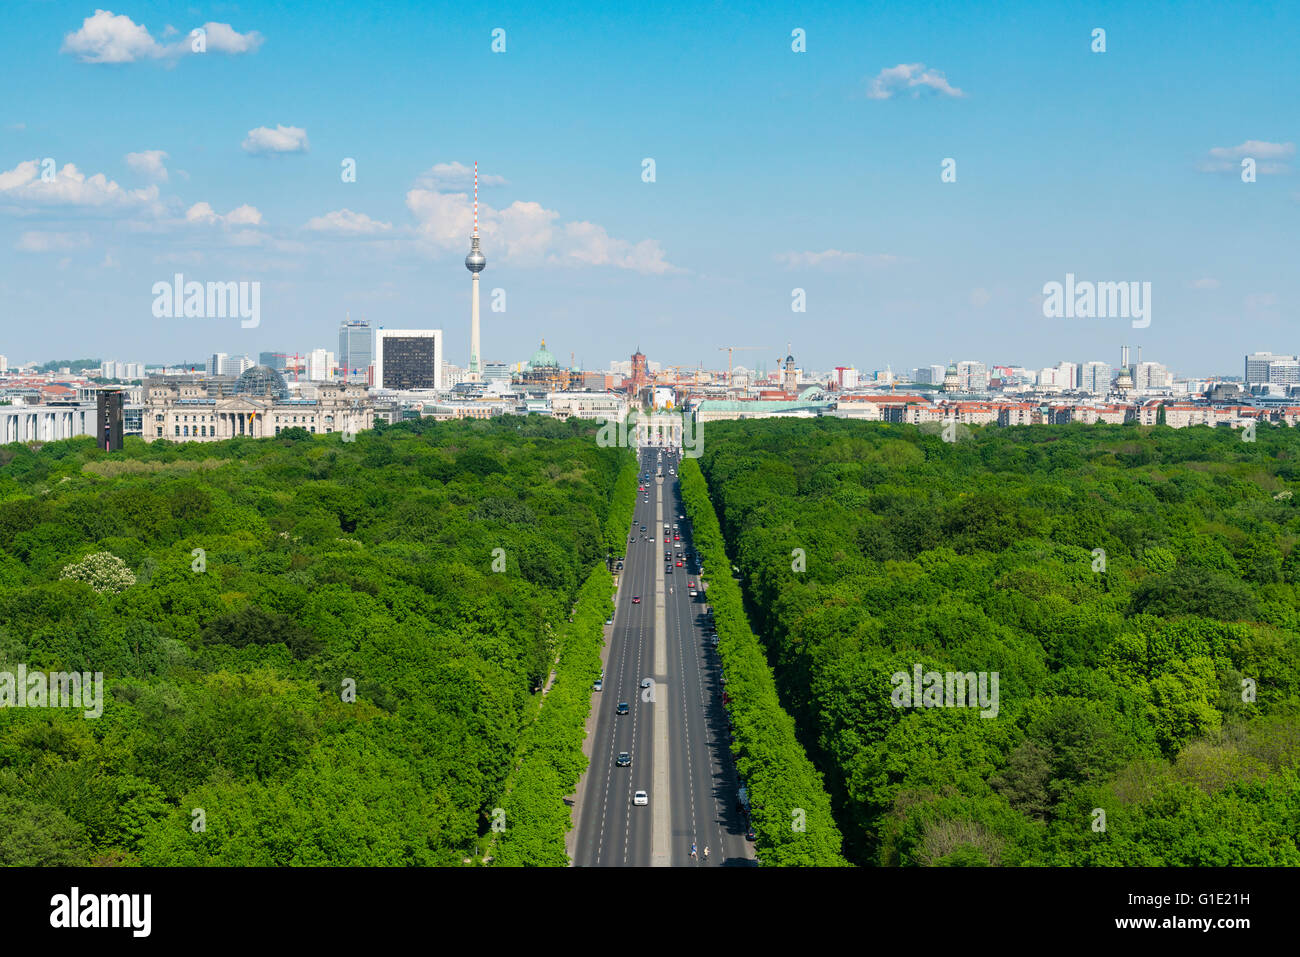 Skyline of Berlin and Tiergarten park towards Brandenburg Gate in Germany - Stock Image